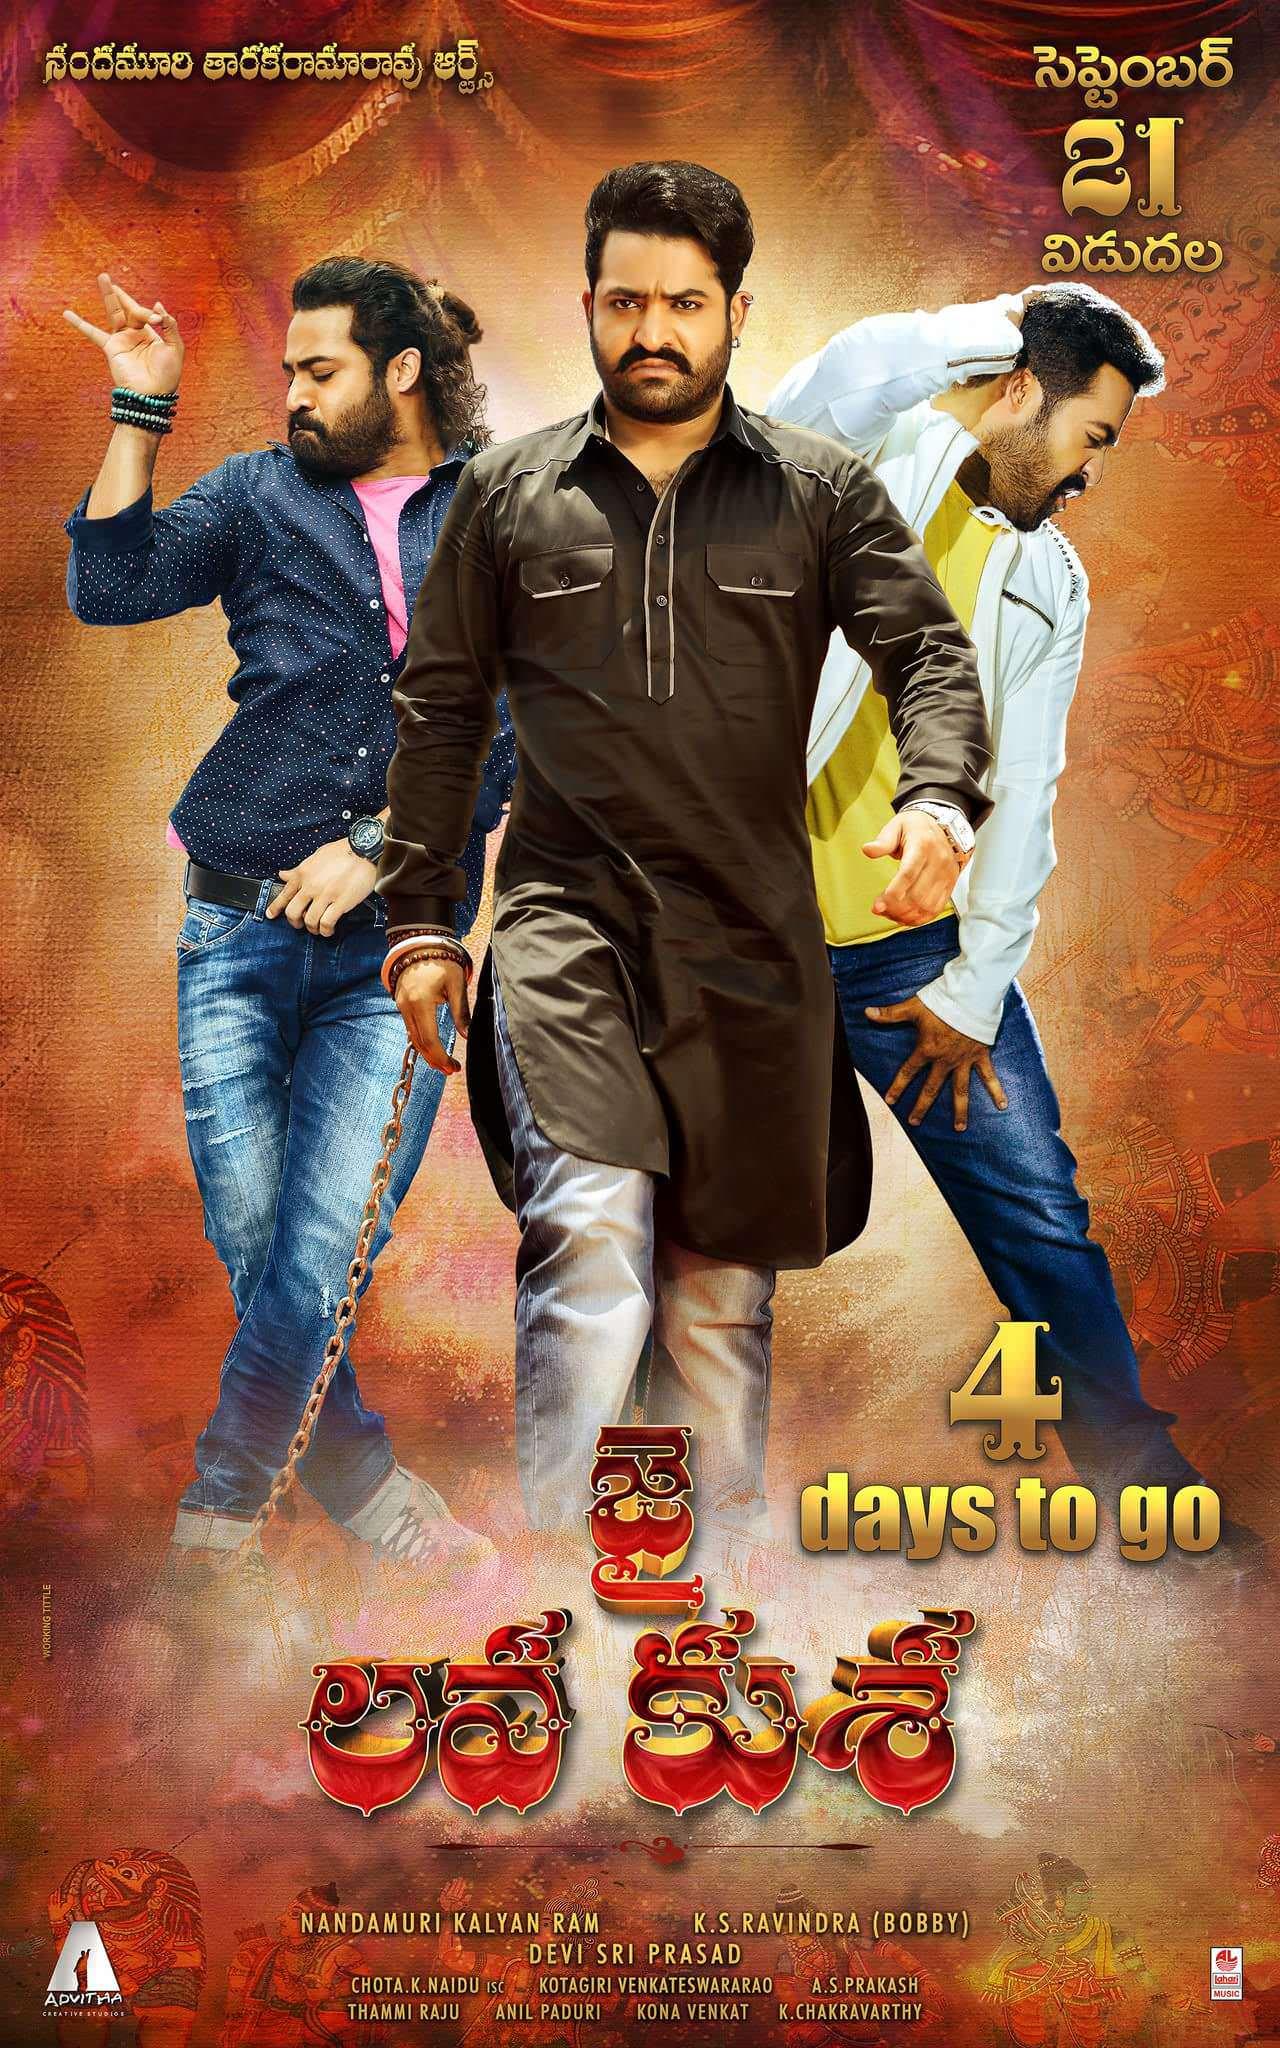 Jai Lava Kusa (2017) Dual Audio Hindi ORG 720p BluRay 1.5GB Download